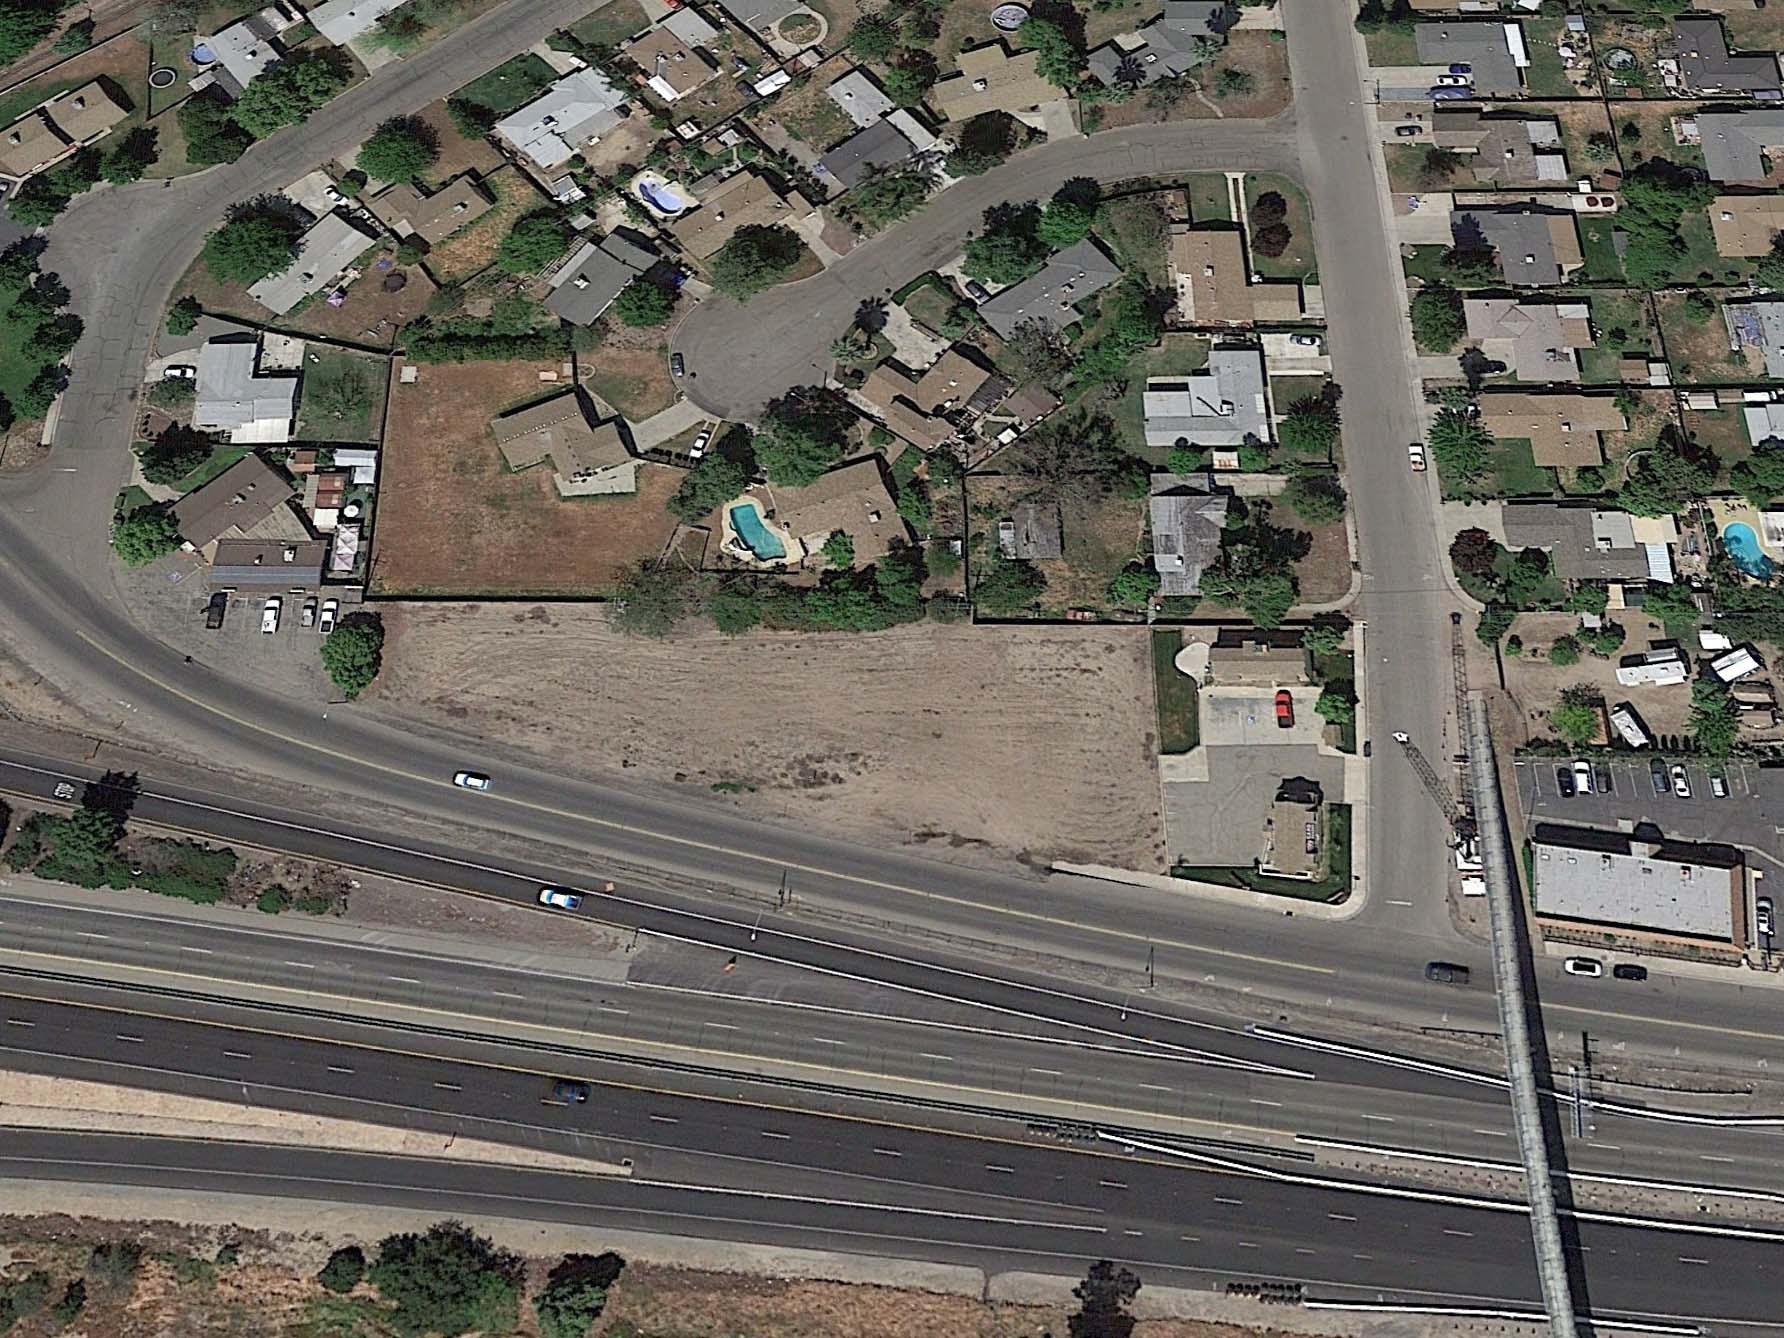 3240 E. Mineral King Ave. | Visalia, CA